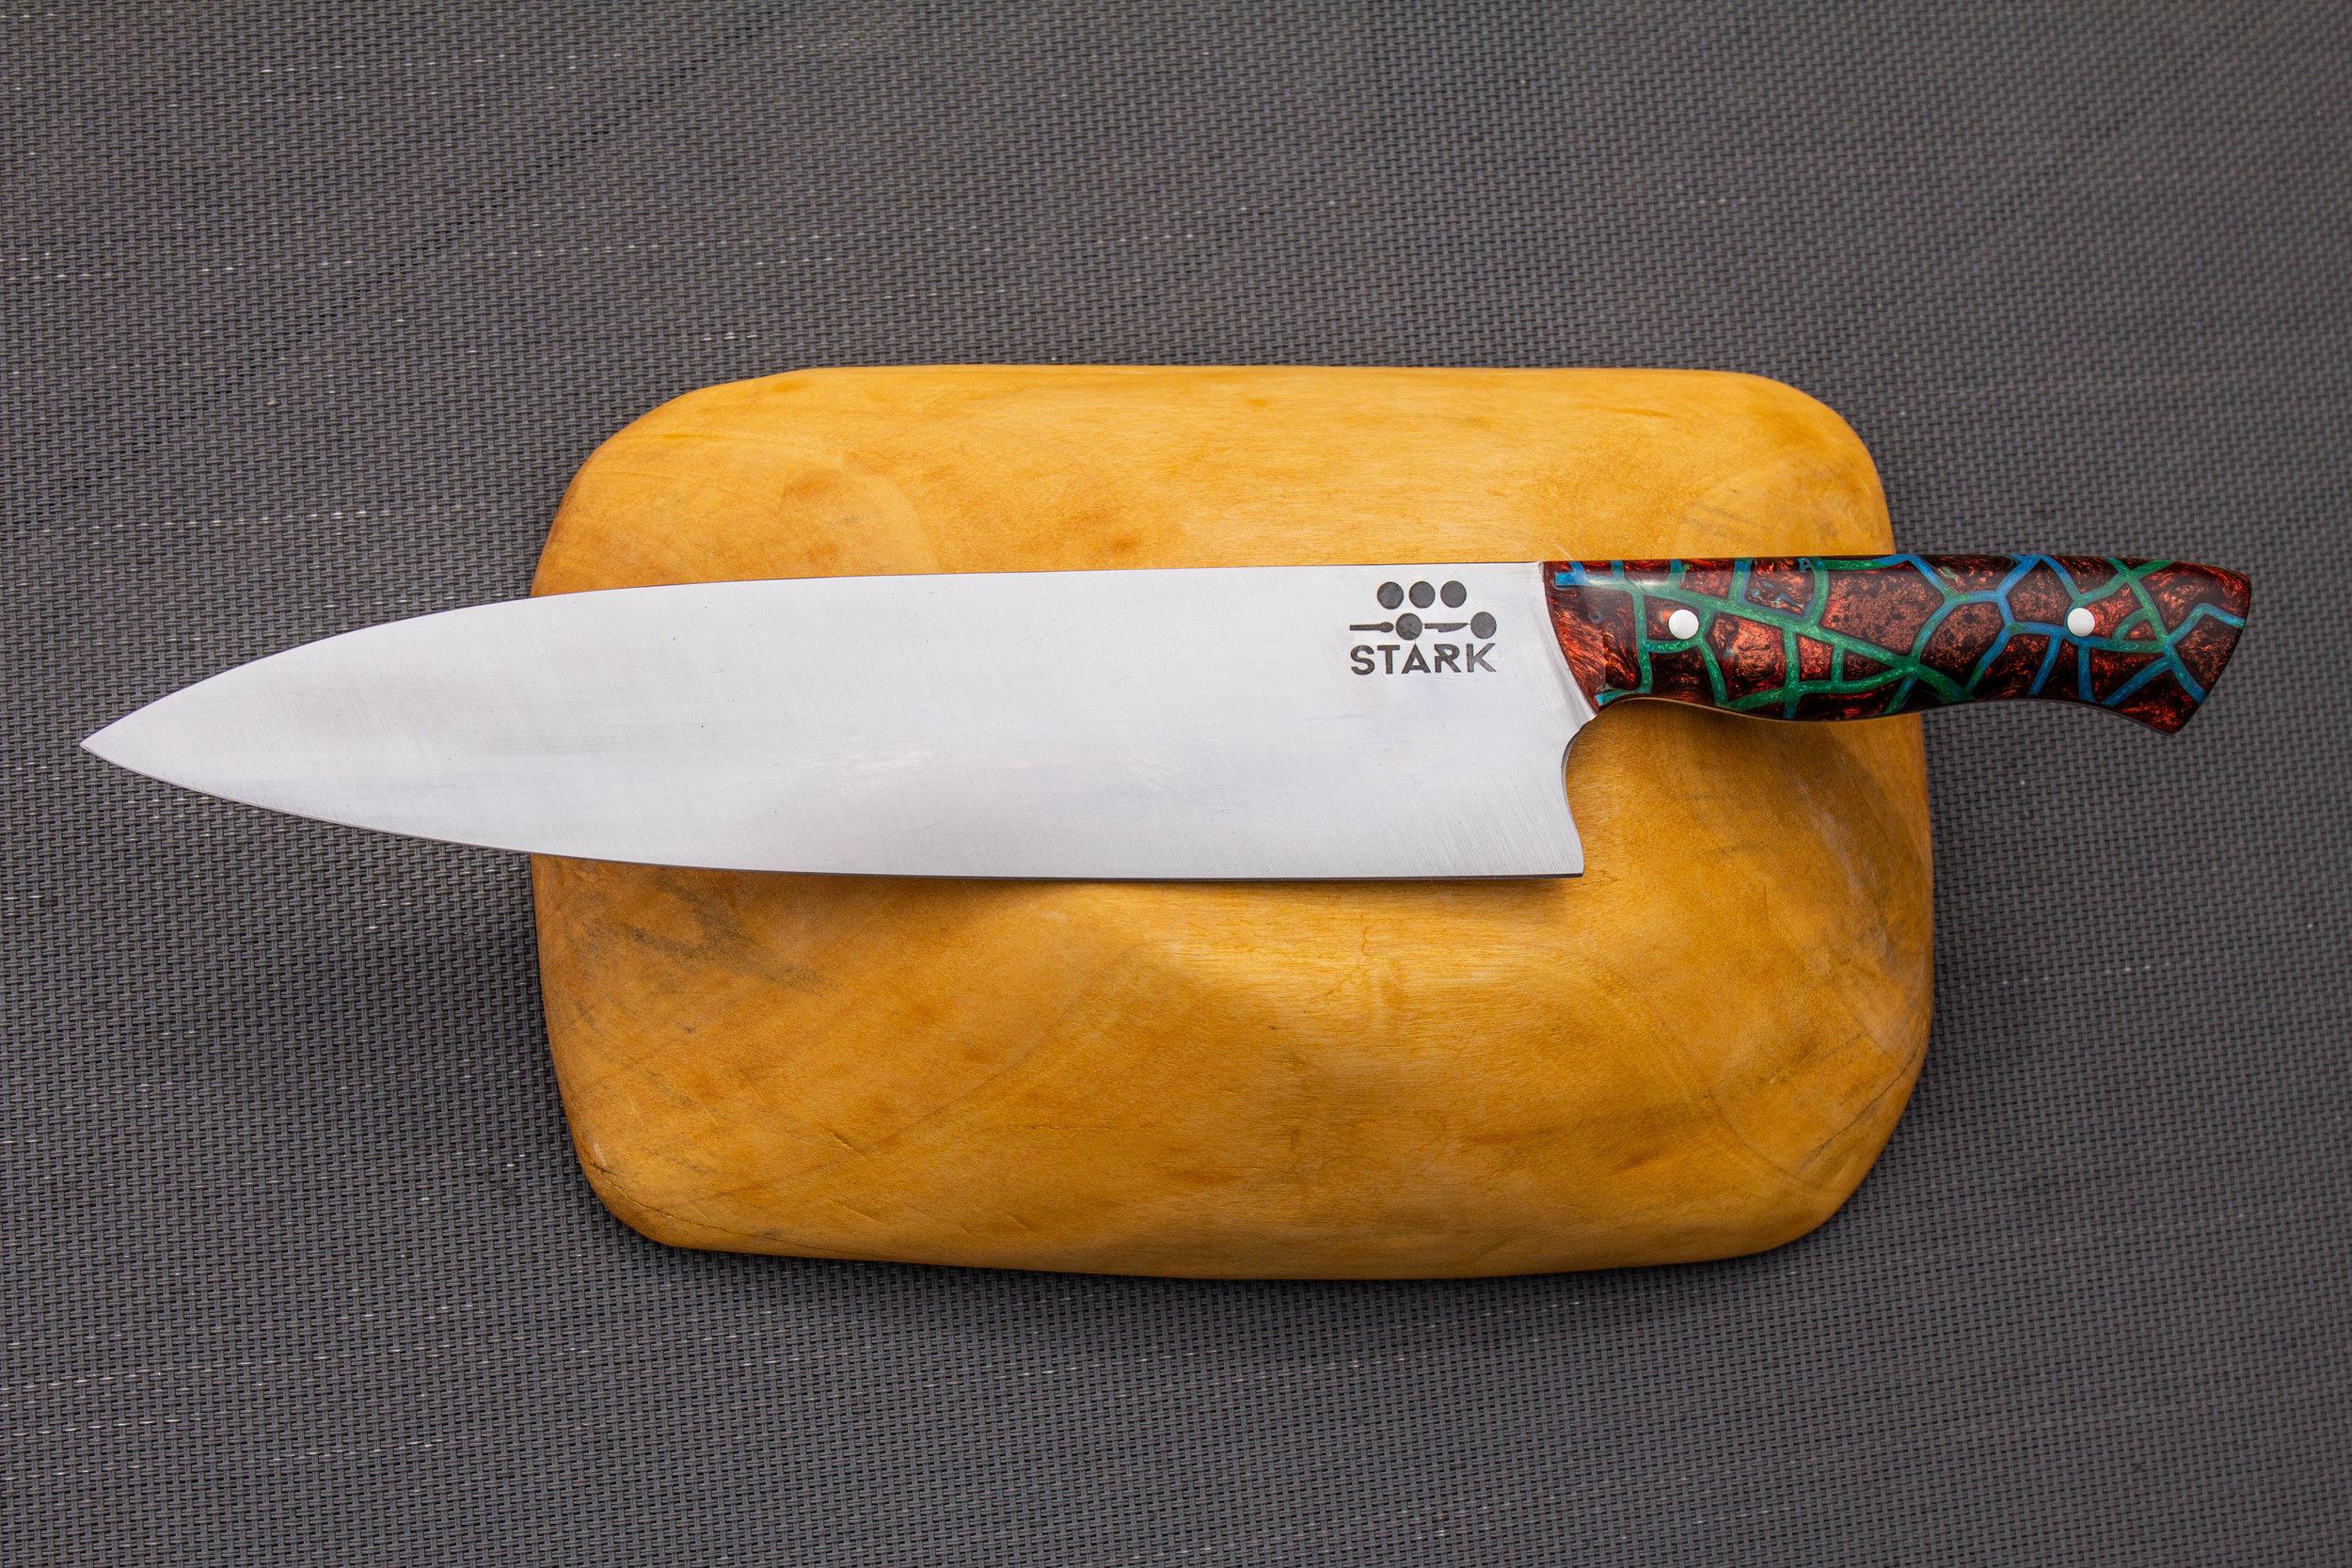 kitchenknives-5.jpg